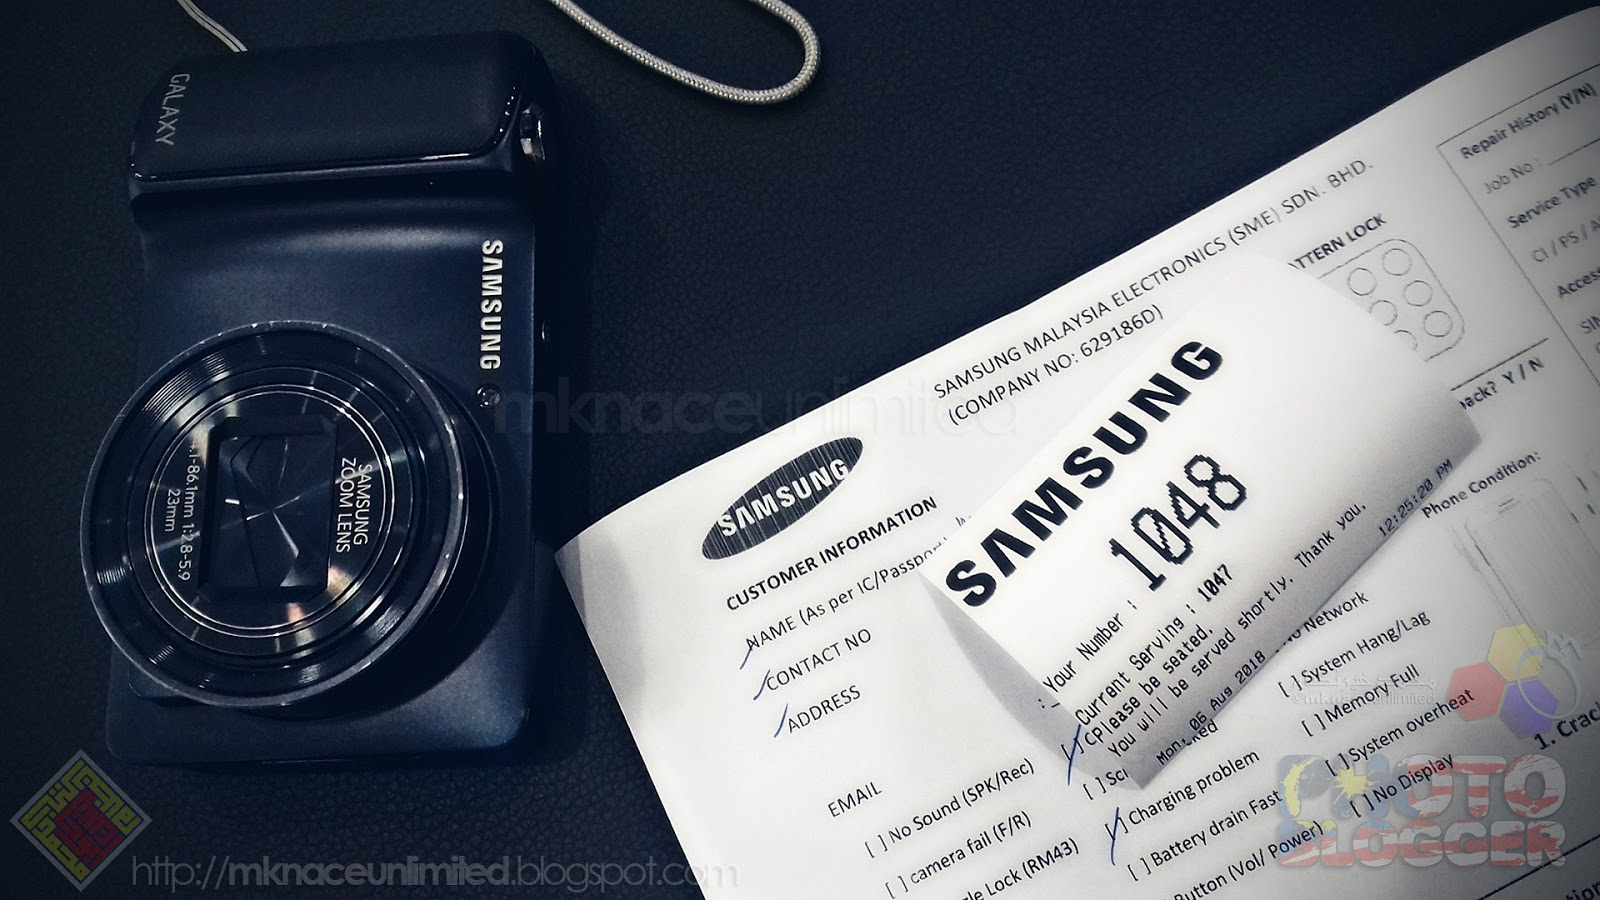 Samsung Servis Centre Taman Molek Akhir Riwayat Abam Galaxy Gudang Garam Filter 12 Batang Gp Garpit International Semalam Gi Ngantor Kamera Yang Tokleh On Tu Isi Borang